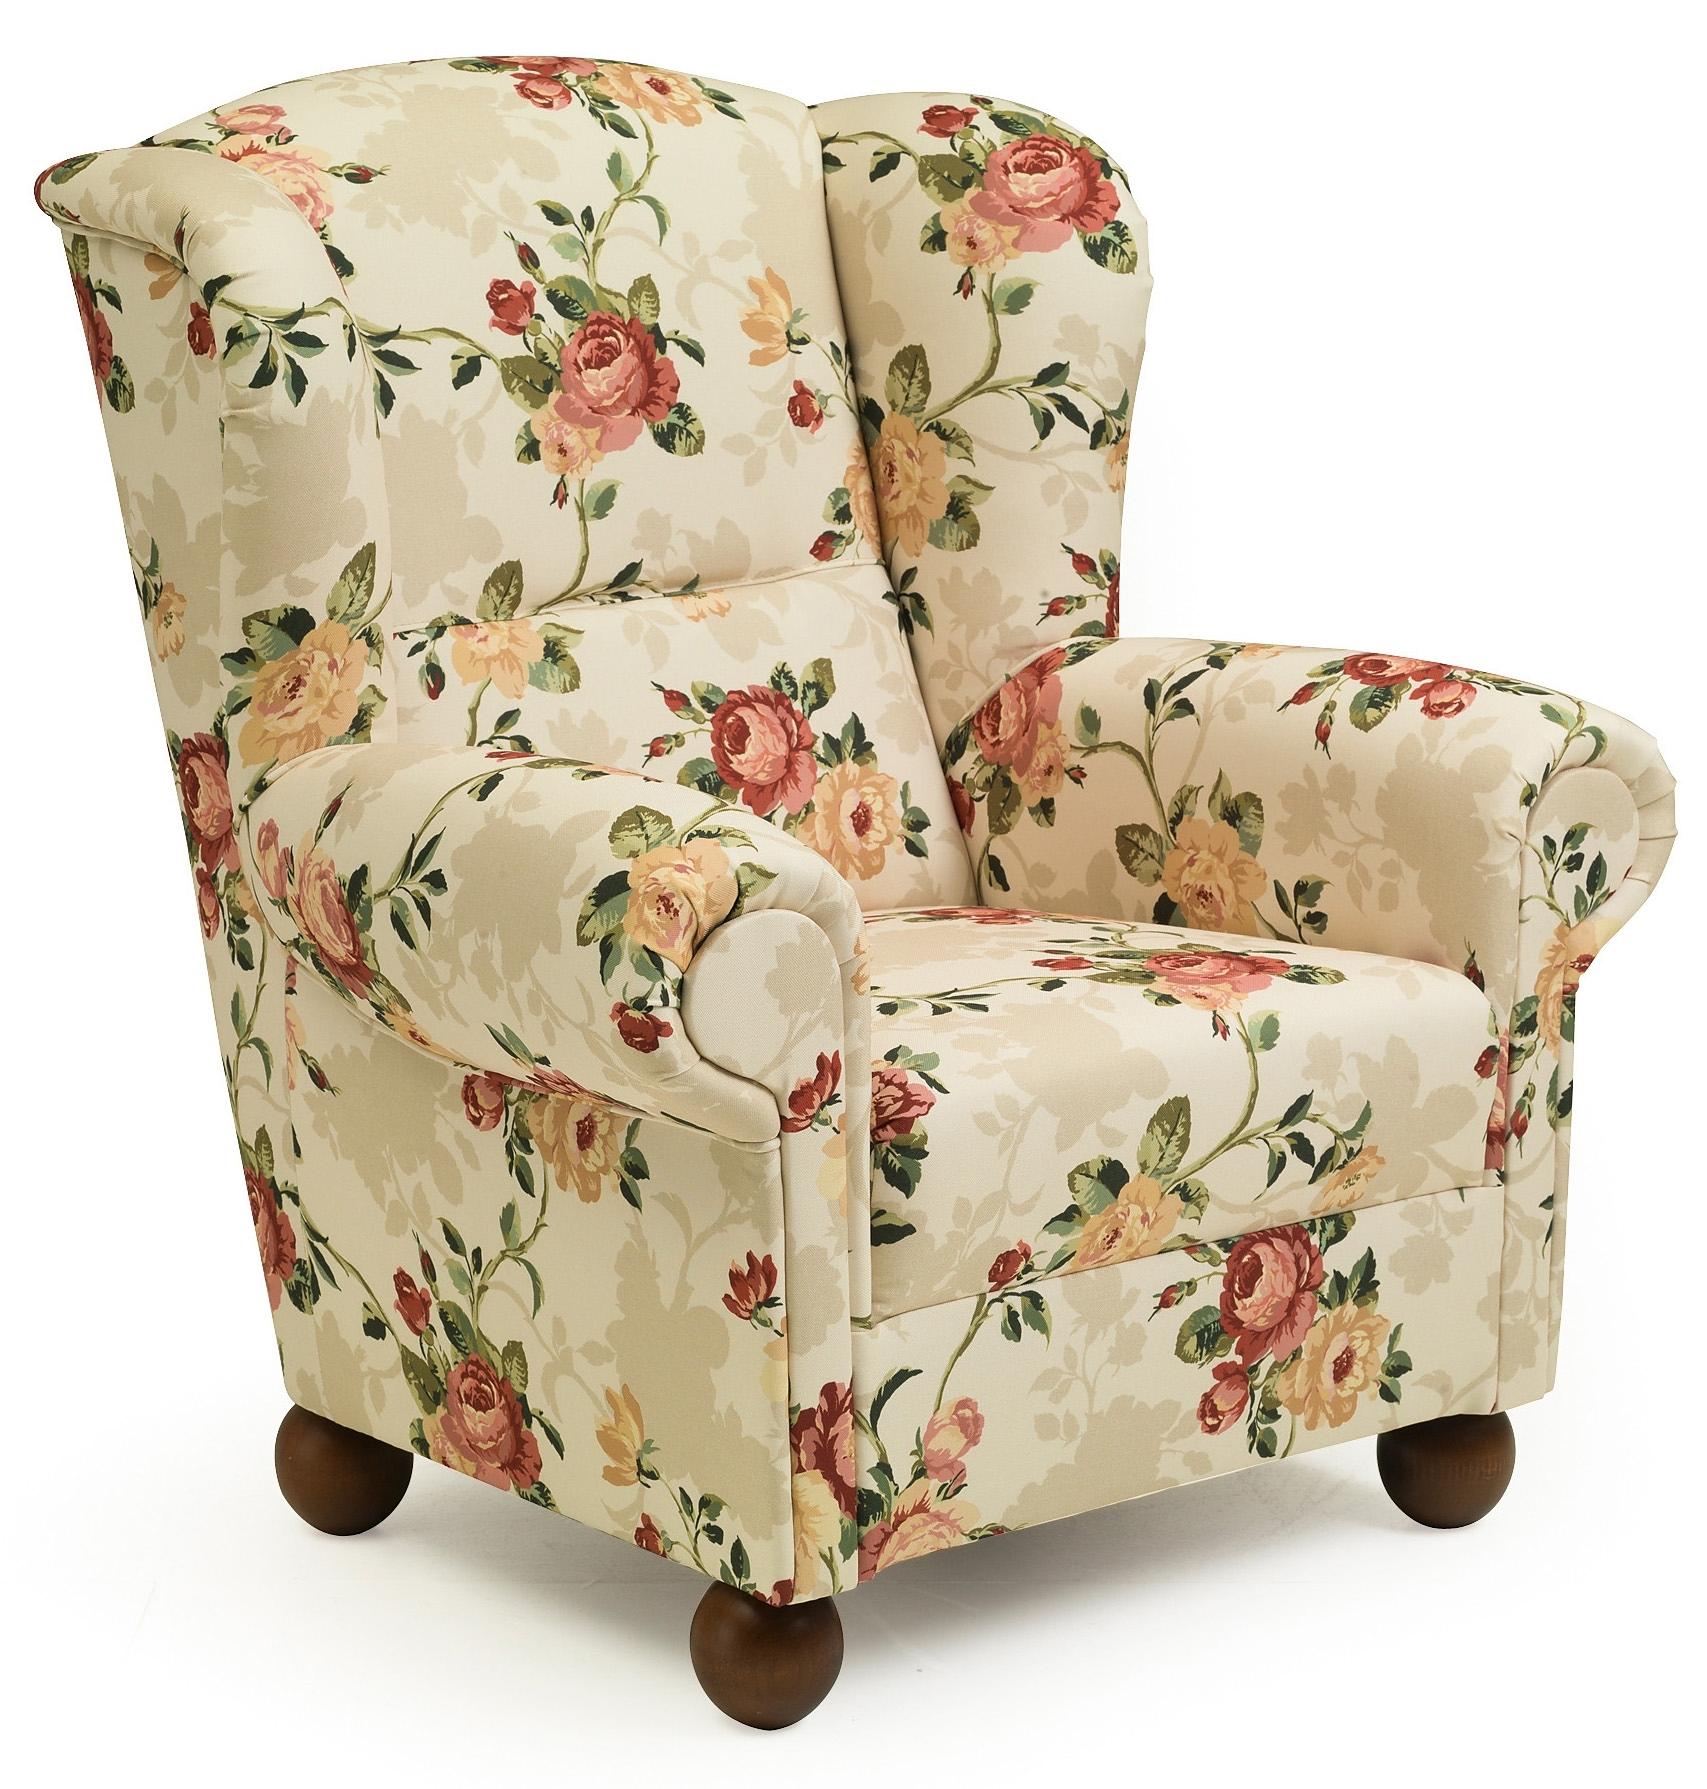 max winzer oorfauteuil malm koop je bij otto. Black Bedroom Furniture Sets. Home Design Ideas